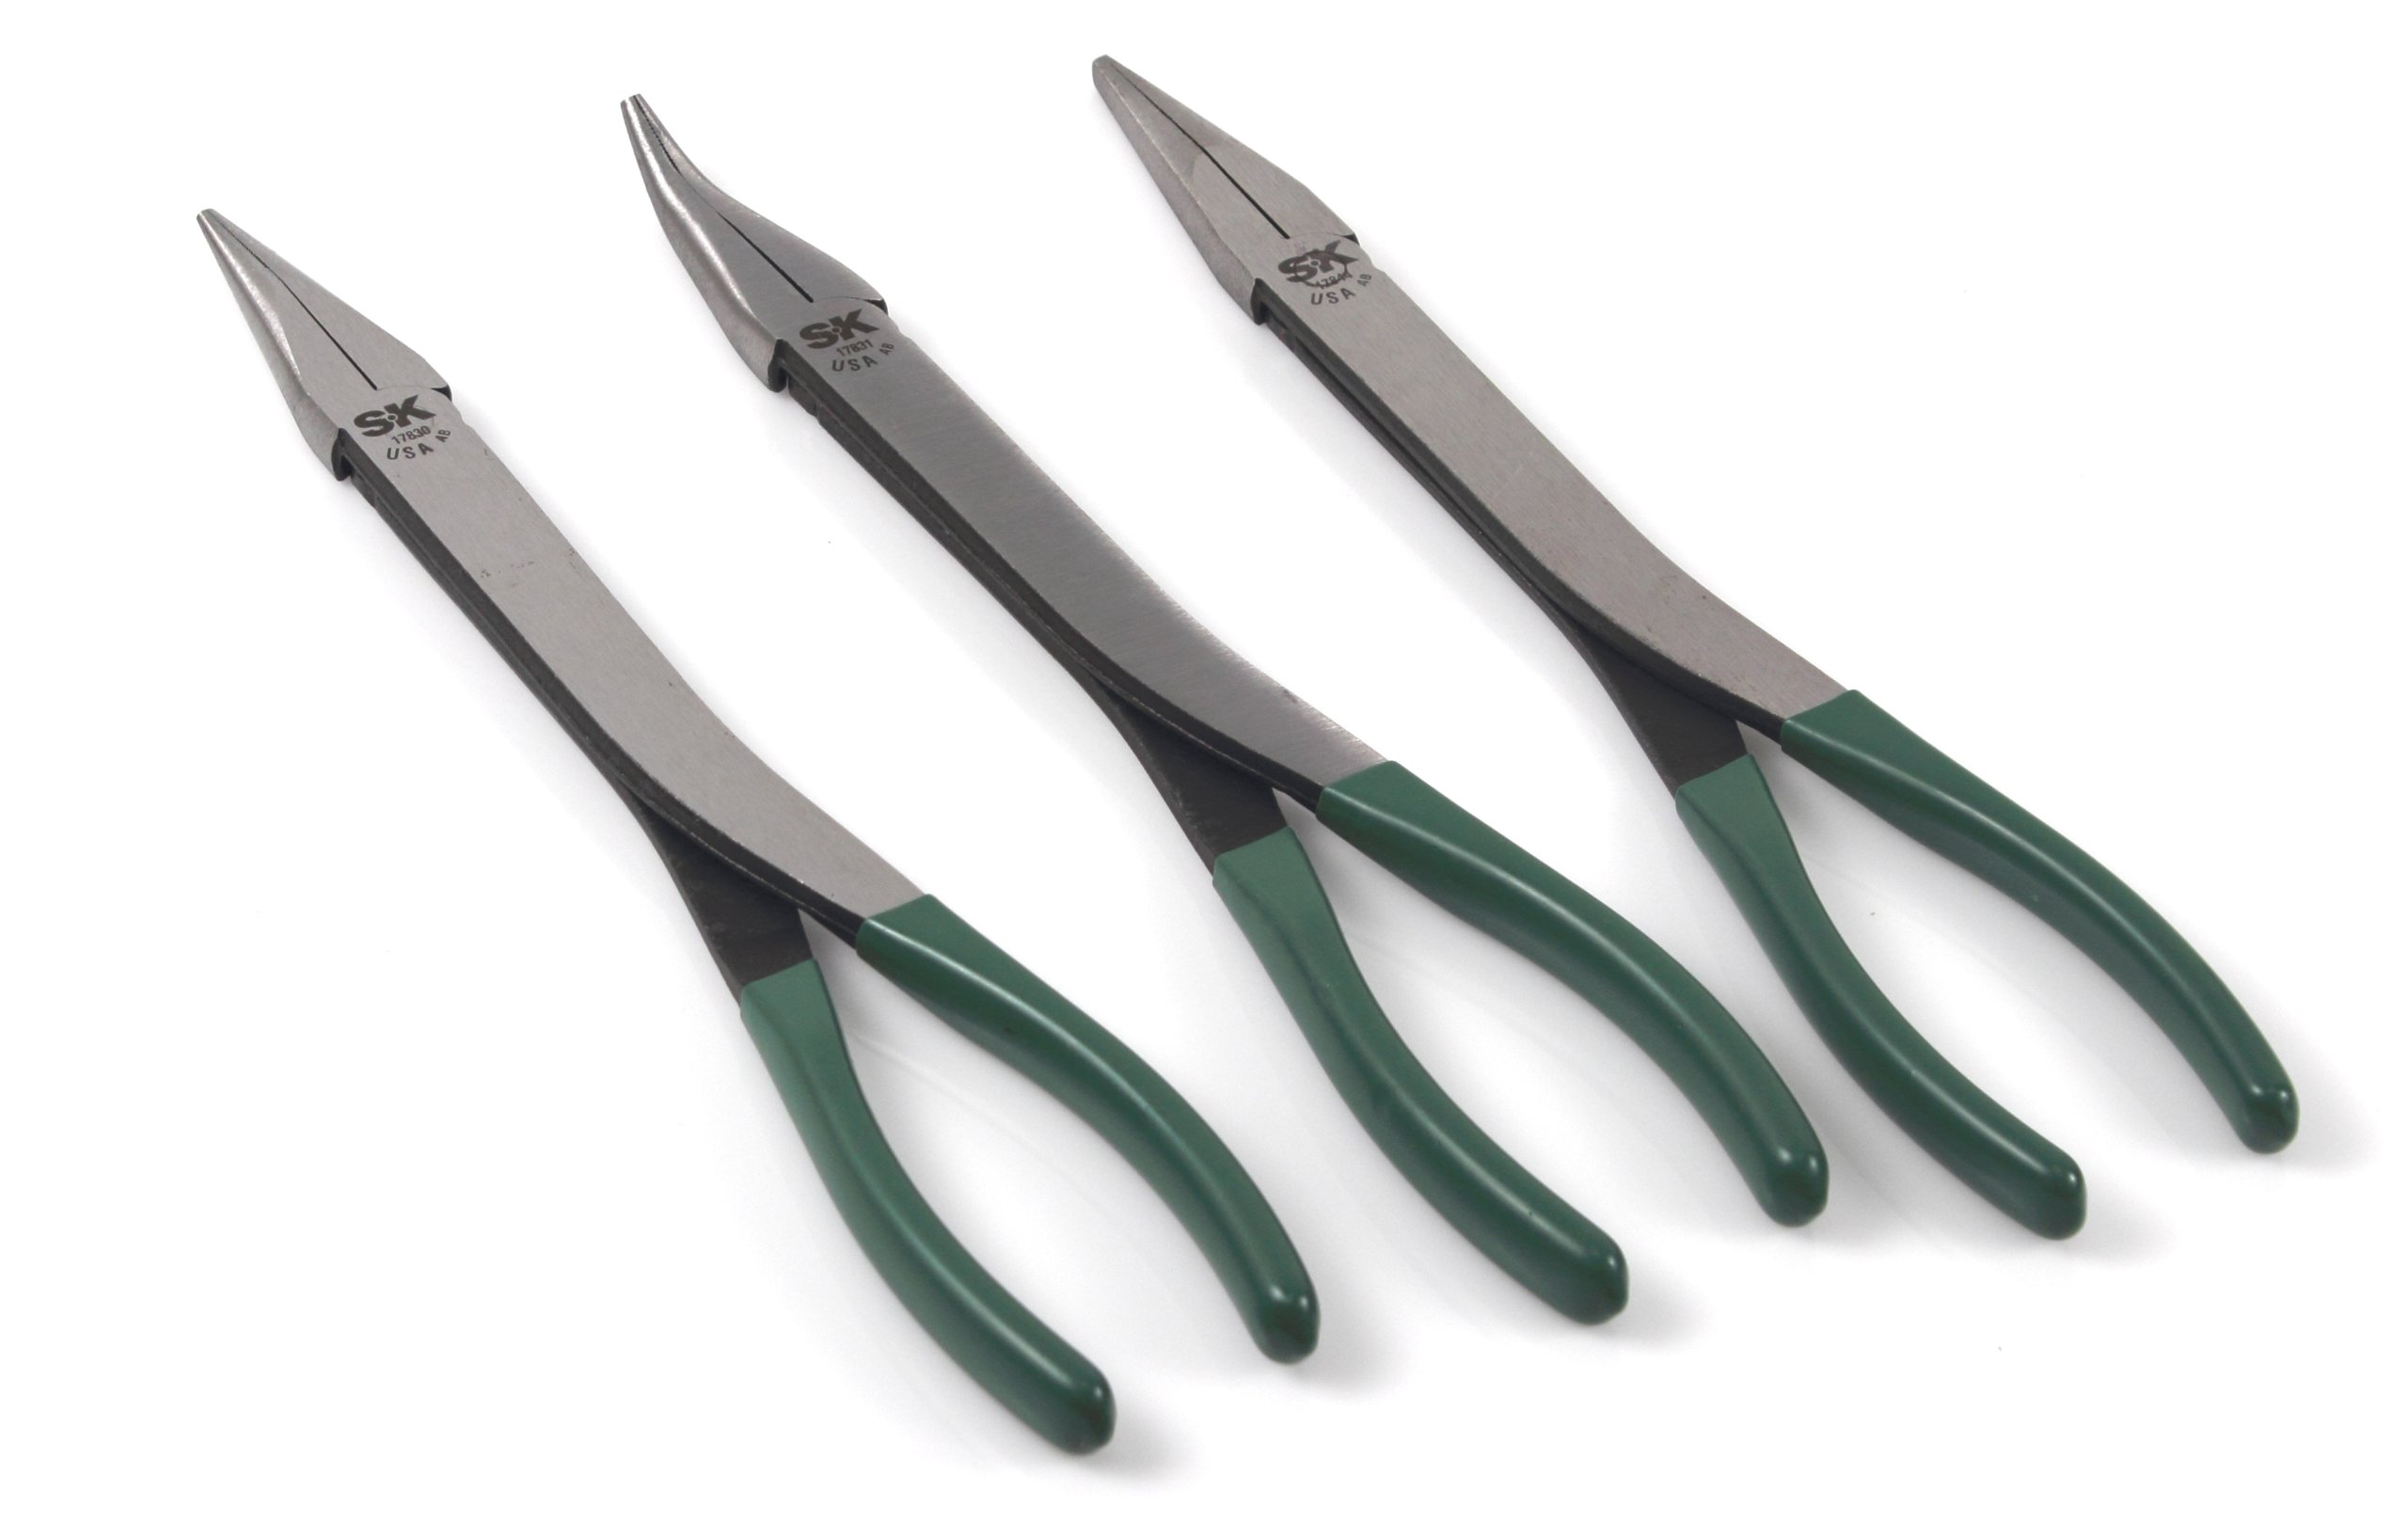 SK Hand Tool 17843 Extra Long Reach Pliers Set, 3-Piece